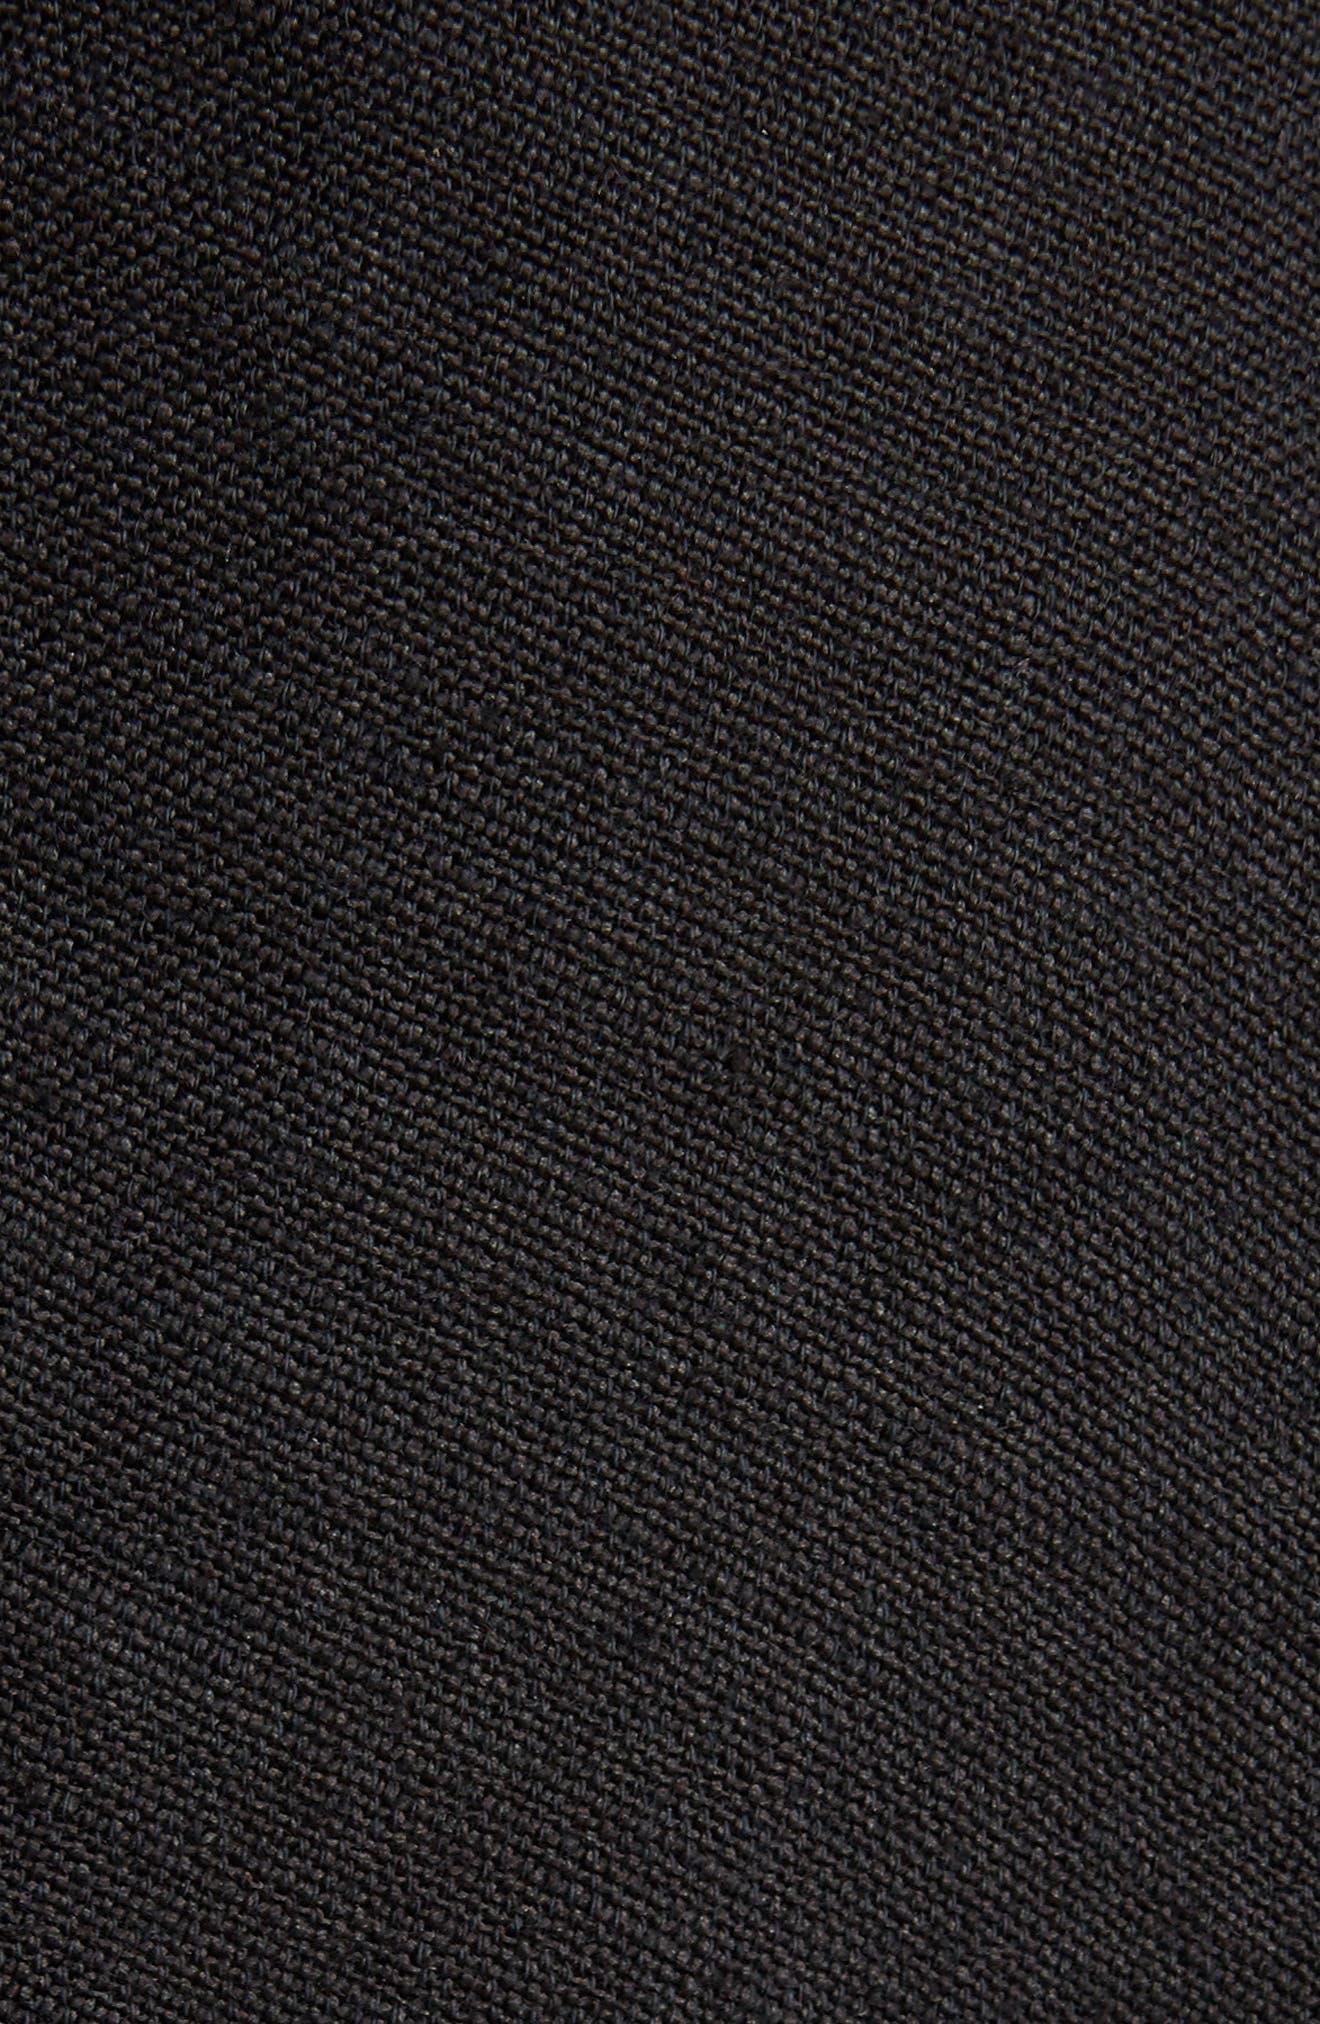 Jessa Shirtdress,                             Alternate thumbnail 5, color,                             001